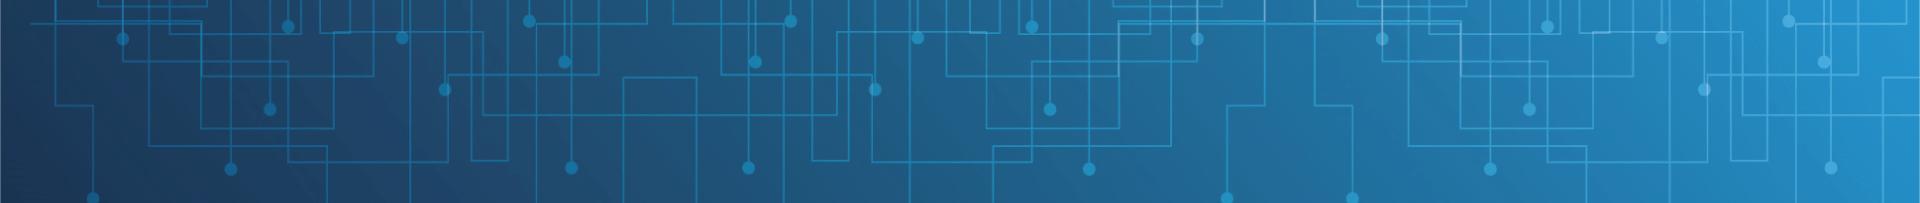 Jouw ICT-vacature blog